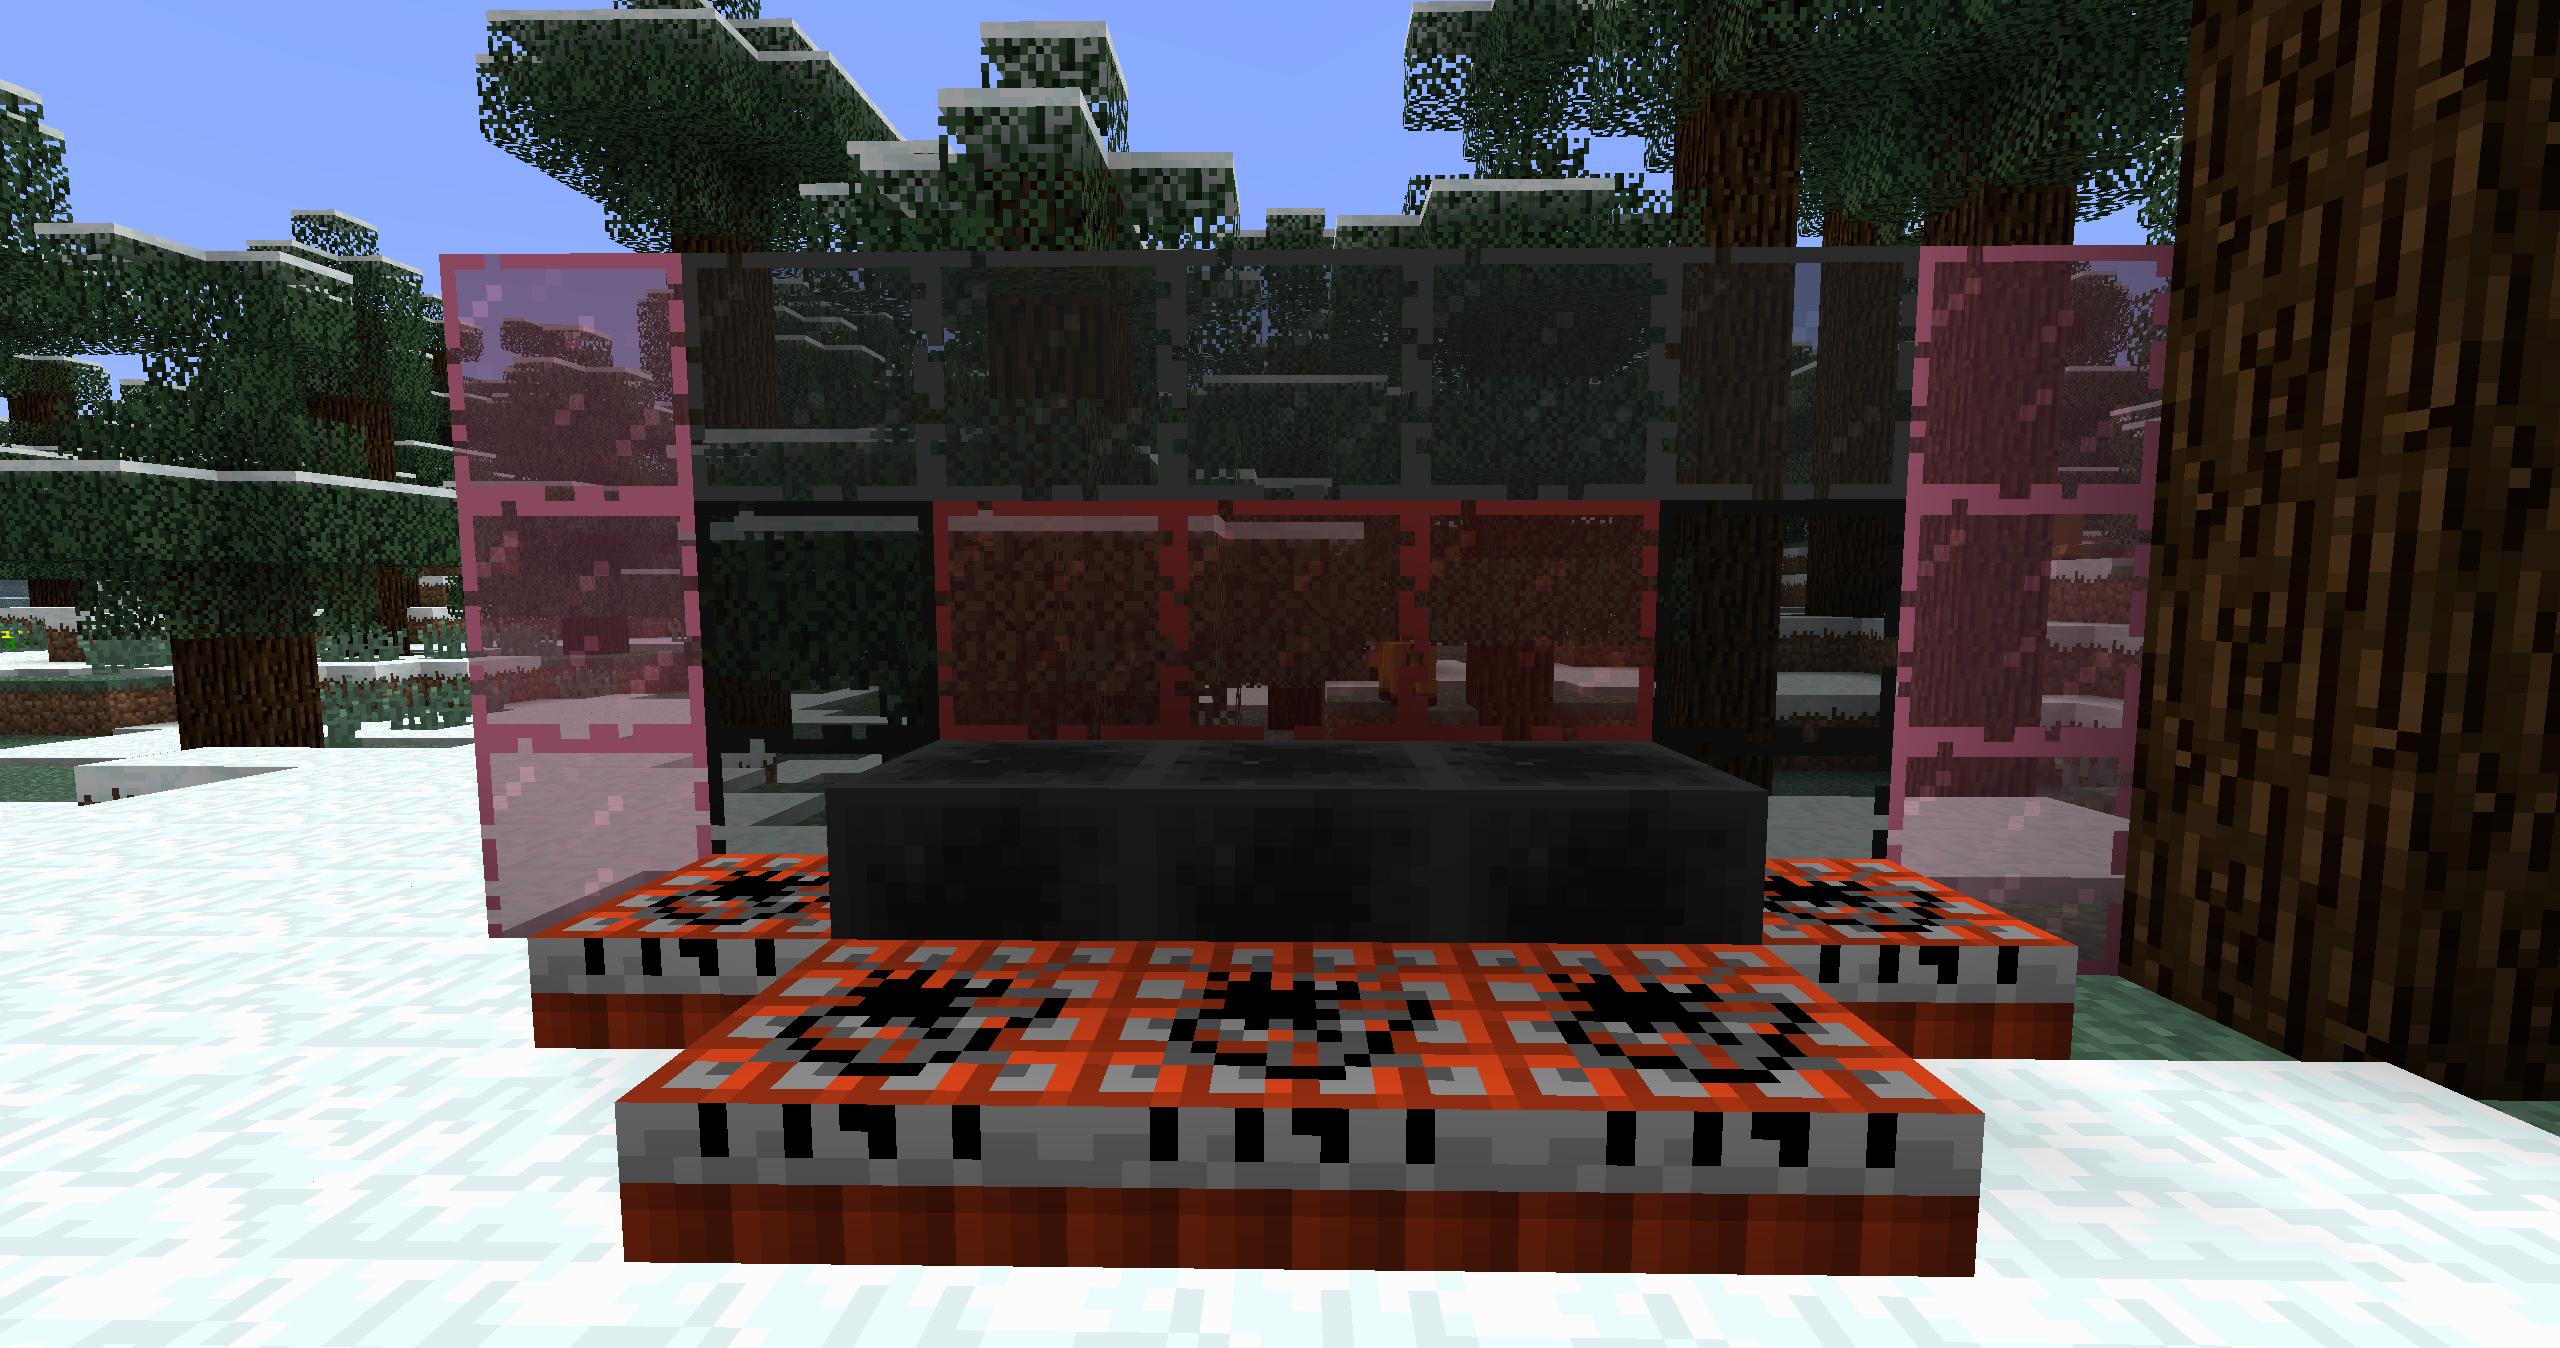 2013 04 04 21.06.09 Minecraft 2.0